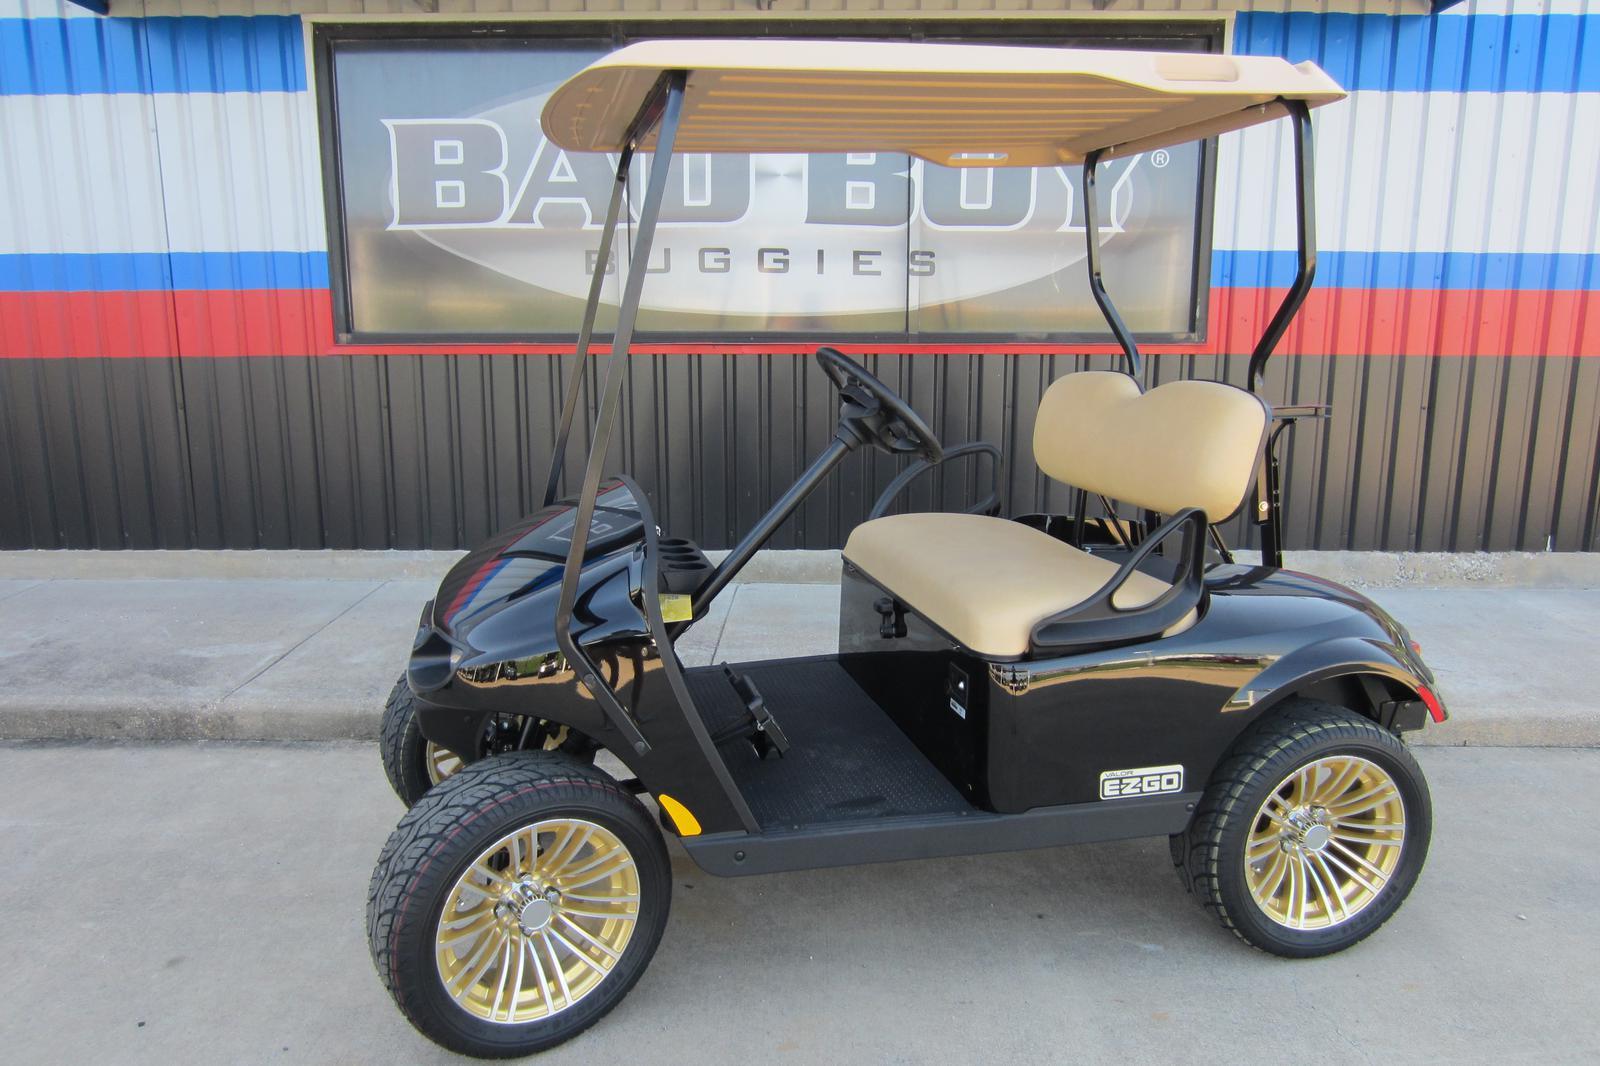 Inventory Extreme Golf Cars Georgetown, TX (512) 635-1851 on old ez go golf cart, ez go golf cart covers, ez go utility carts, 3 wheel ez go golf cart, ez go electric golf cart, ez go golf cart models years, ez go total charger, ez go golf cart tires, ez go golf cart parts, 2002 ez go golf cart, 19 72 ez go 3 wheeled golf cart, ez go golf cart manufacturer, ez go jacobsen golf cart,